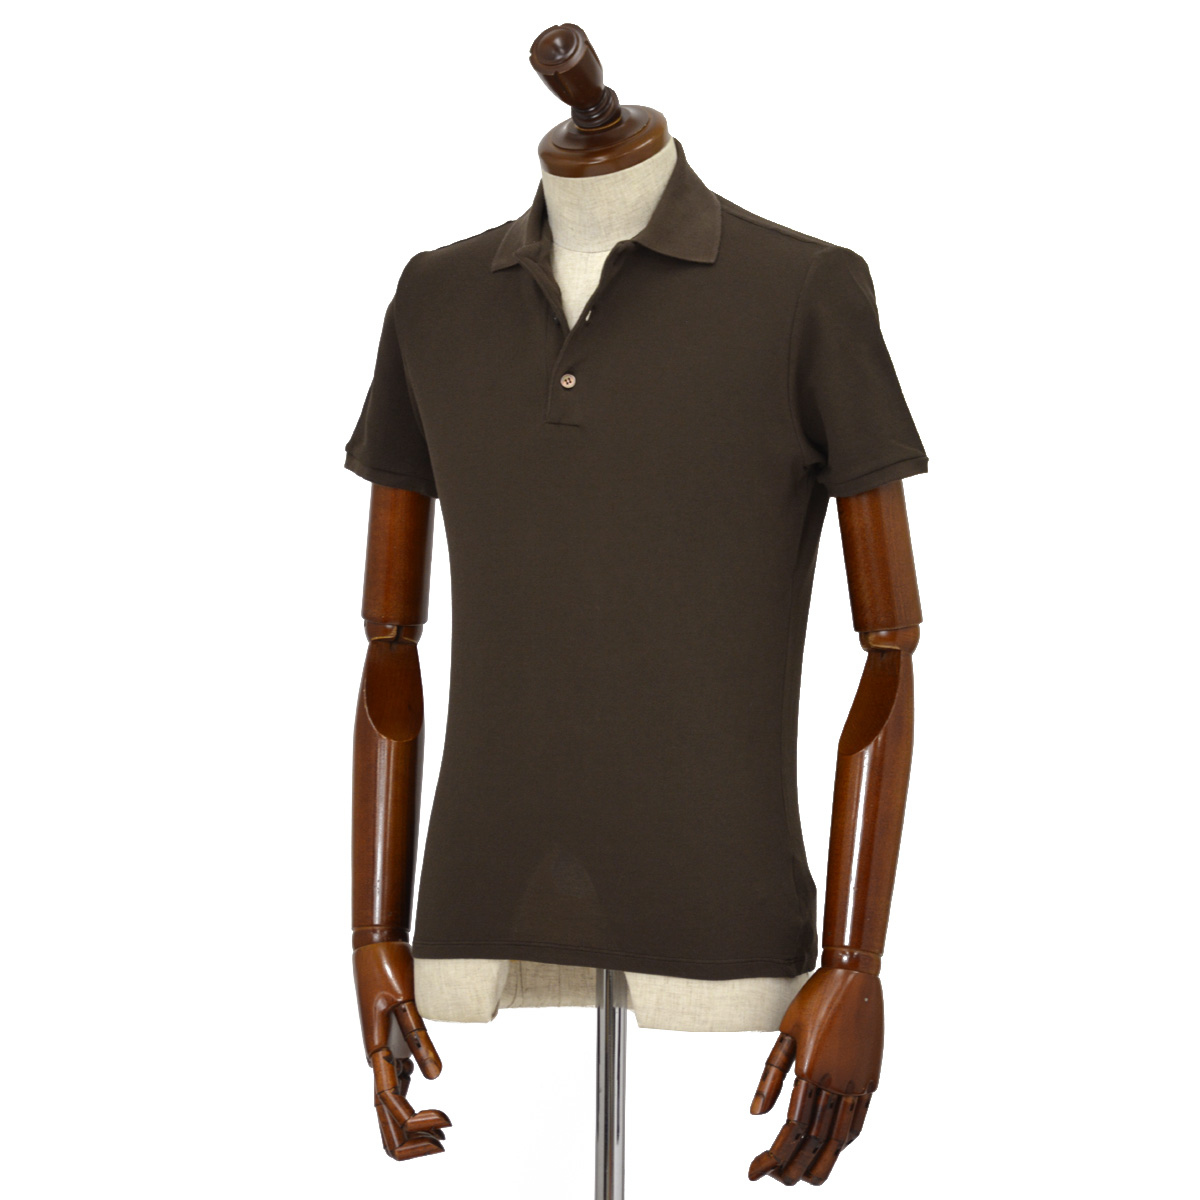 ZANONE【ザノーネ】ポロシャツ 812081 ZW370 Z4759 アイスピケ コットン ダークブラウン